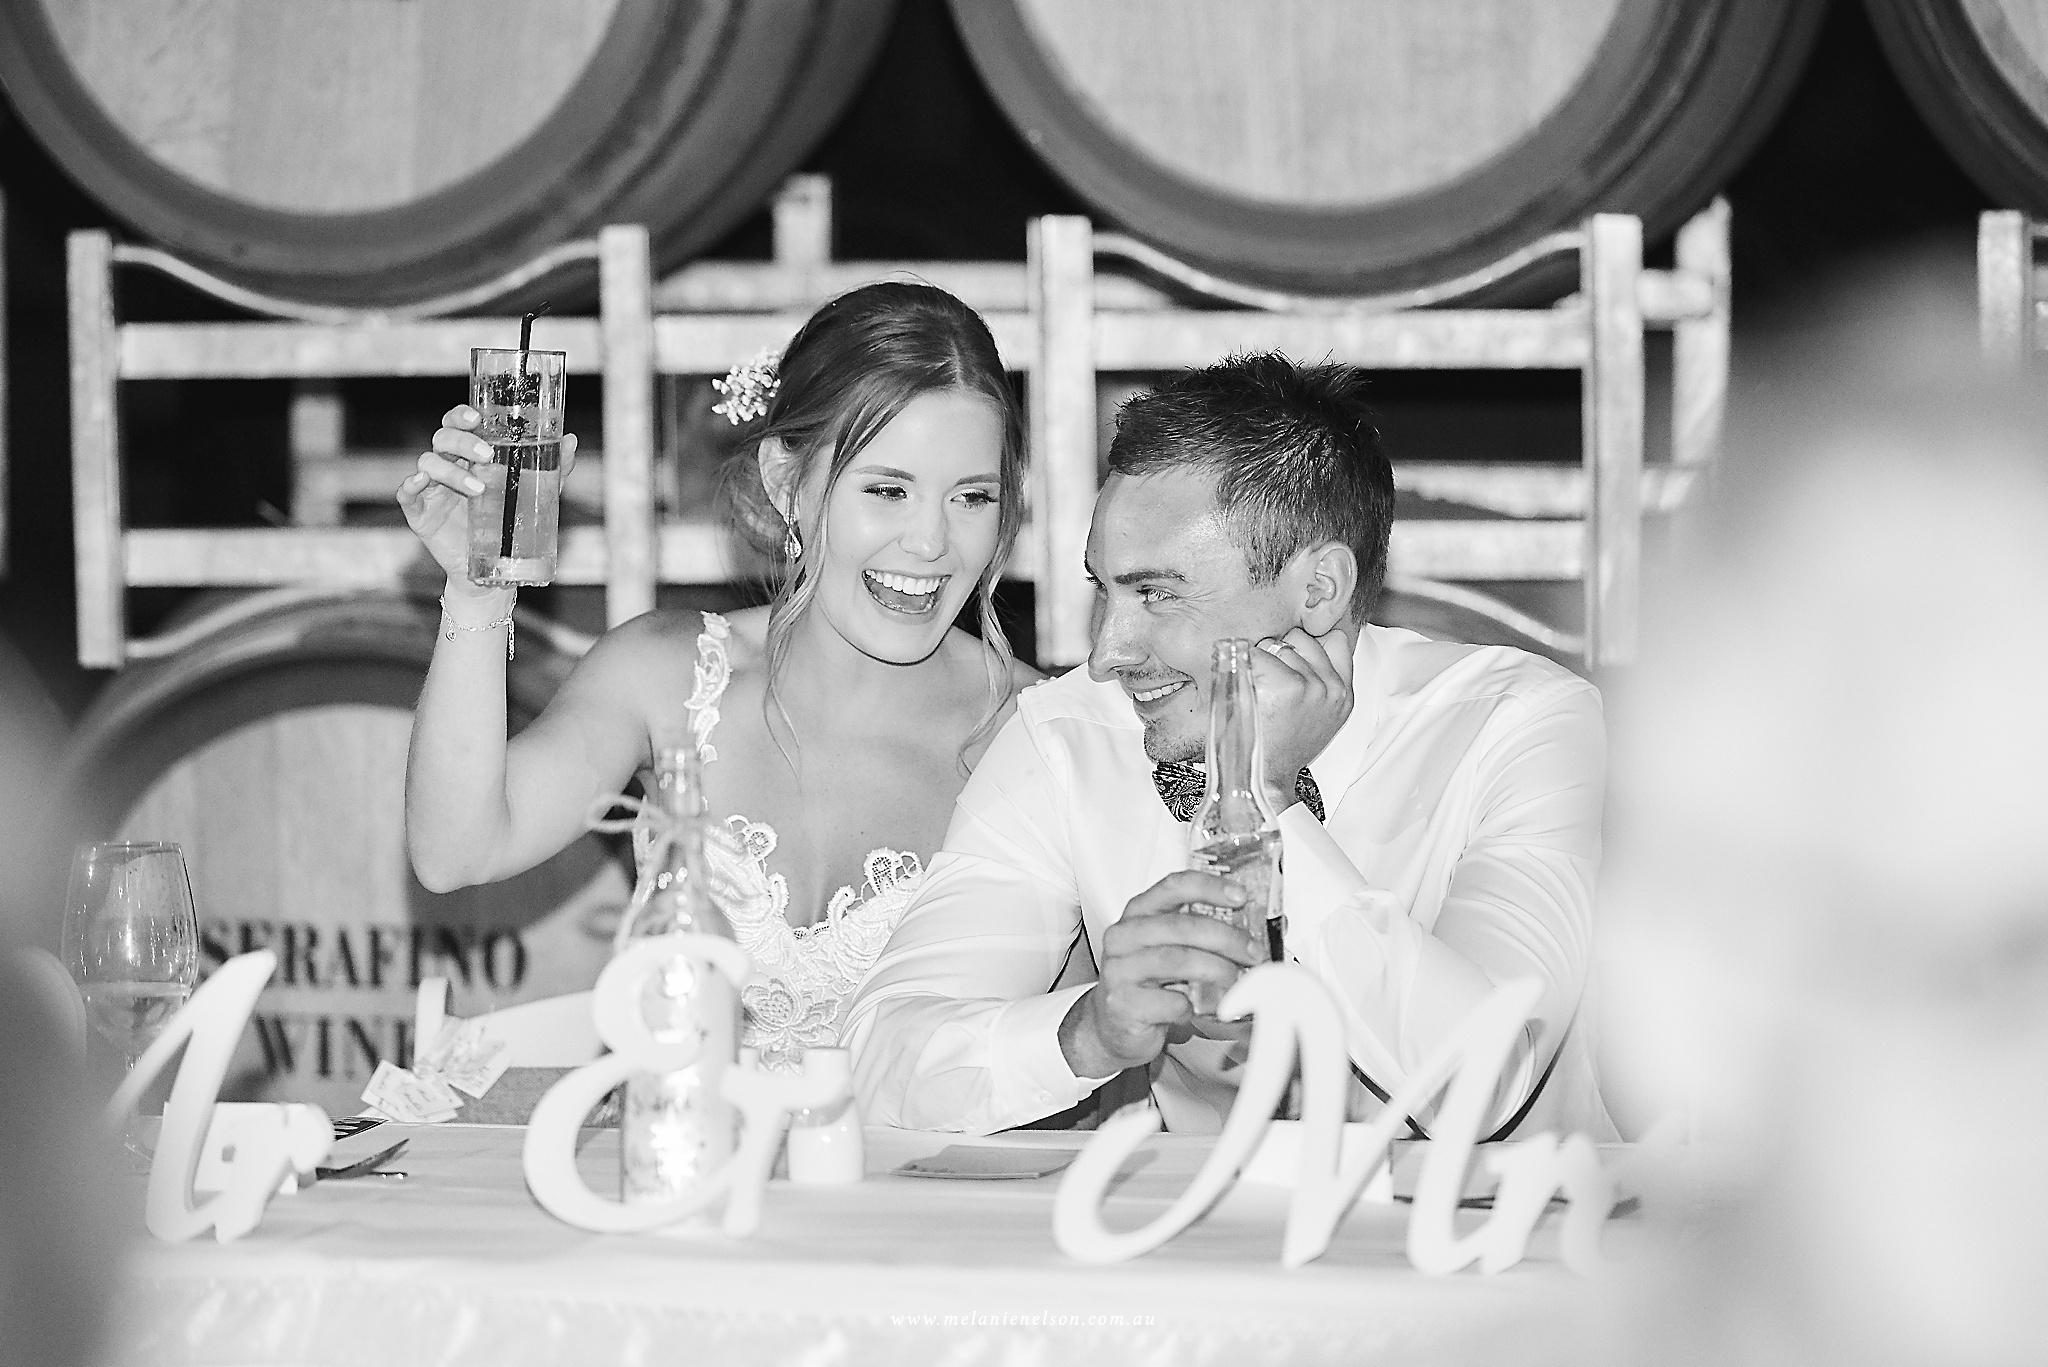 serafino_wedding_photography_0077.jpg